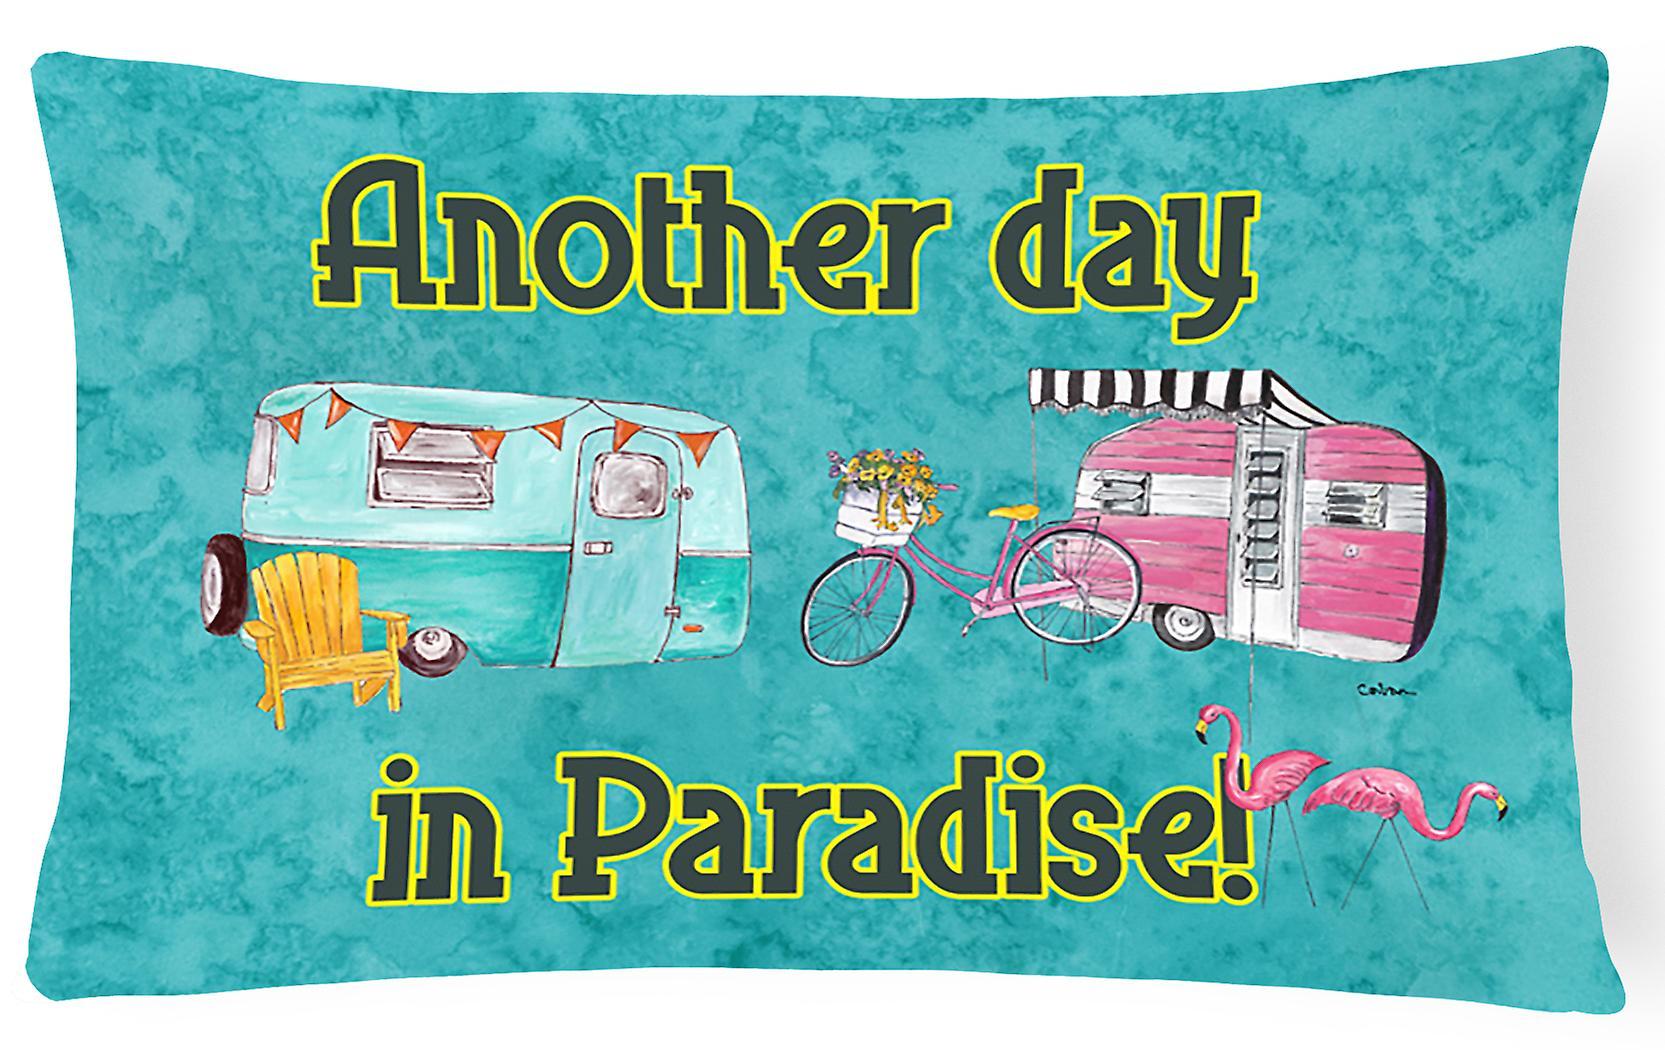 Day In Trésors Toile Decorati Another Tissu Paradise Carolines 8758pw1216 wPTkXZOiu